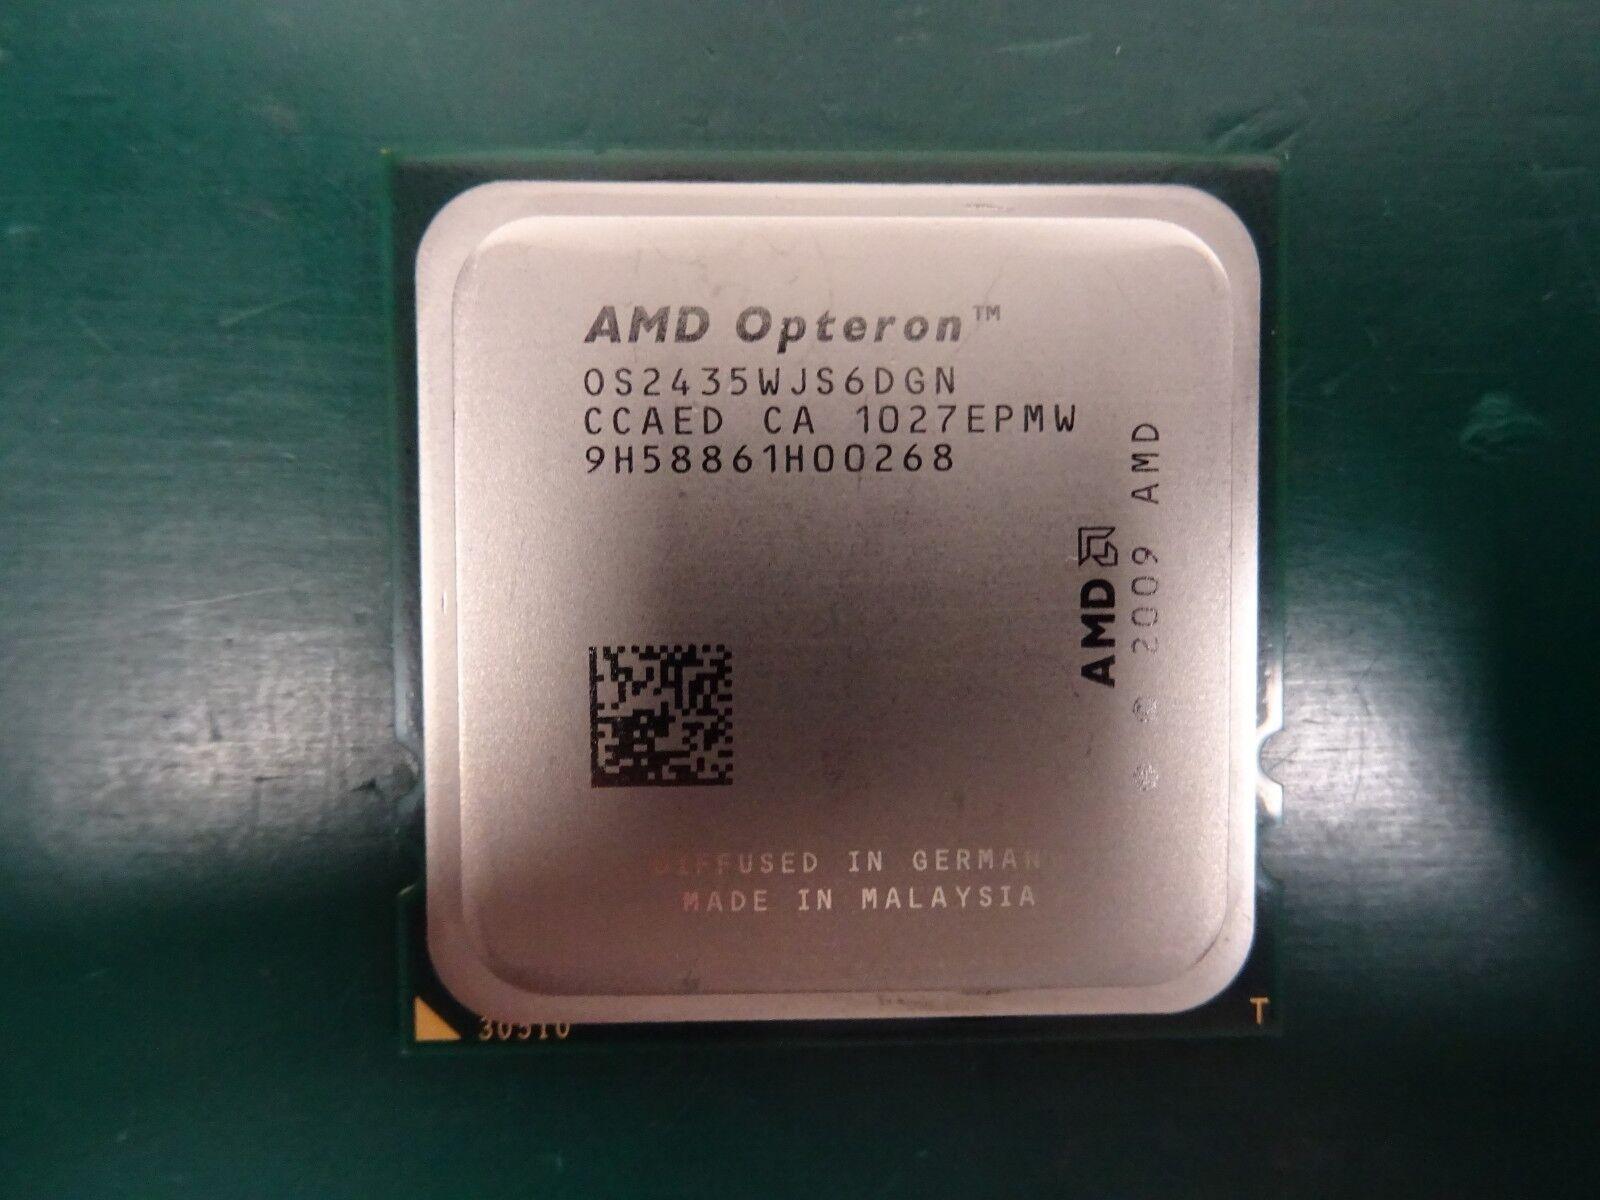 10 x AMD Opteron Processor CPU 2435 OS2435WJS6DGN 2.6GHz 6 Core 115w JOB LOT